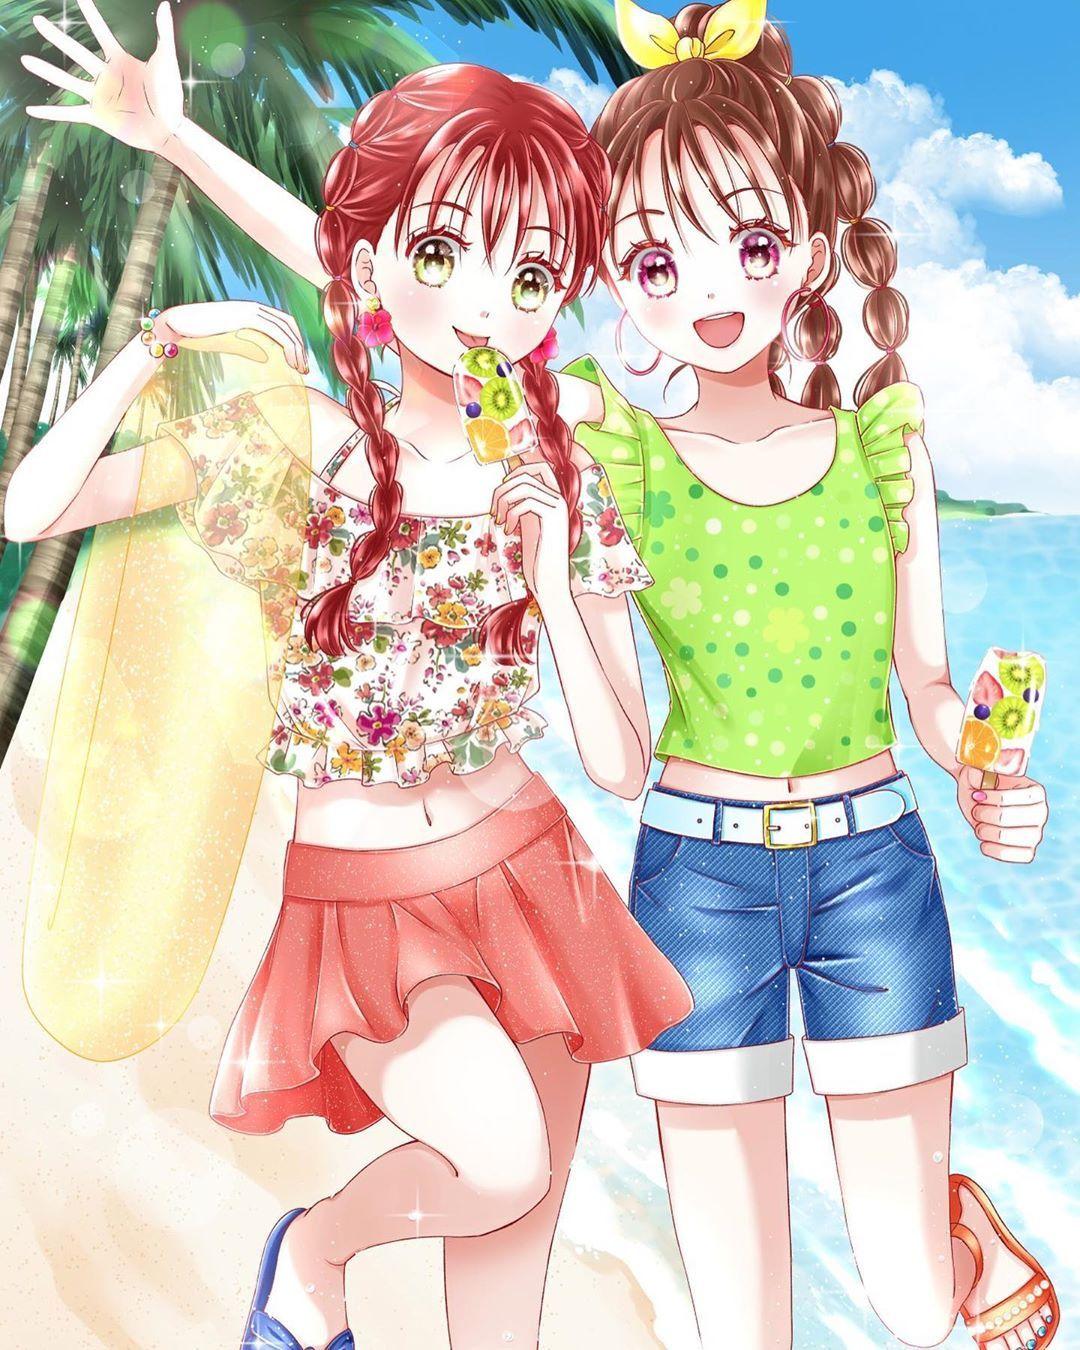 tumblr anime art